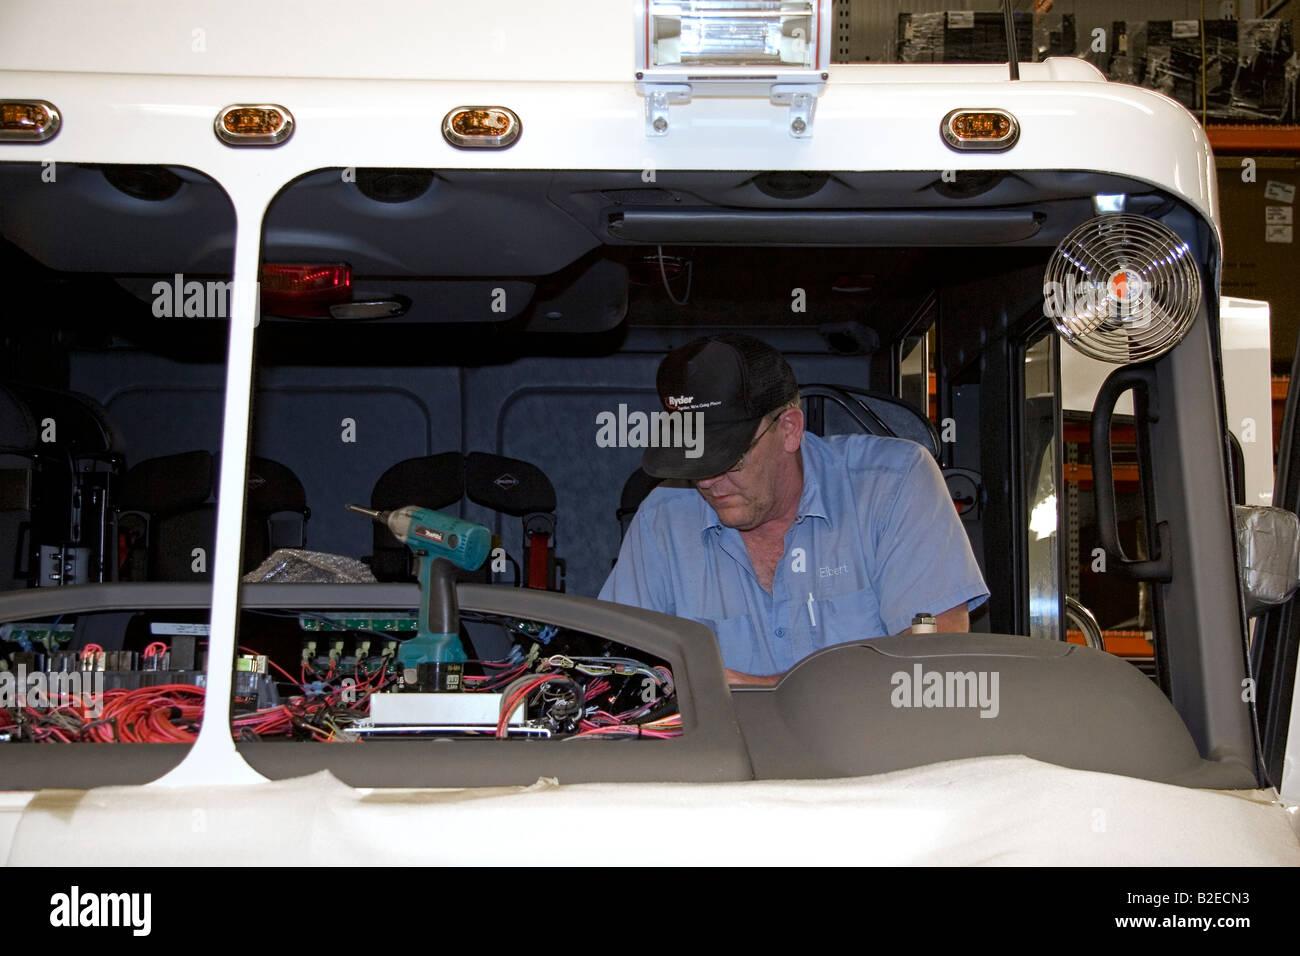 2005 Spartan Chassis Diagram Wiring Master Blogs Motorhome Chis Impremedia Net Camper Motors